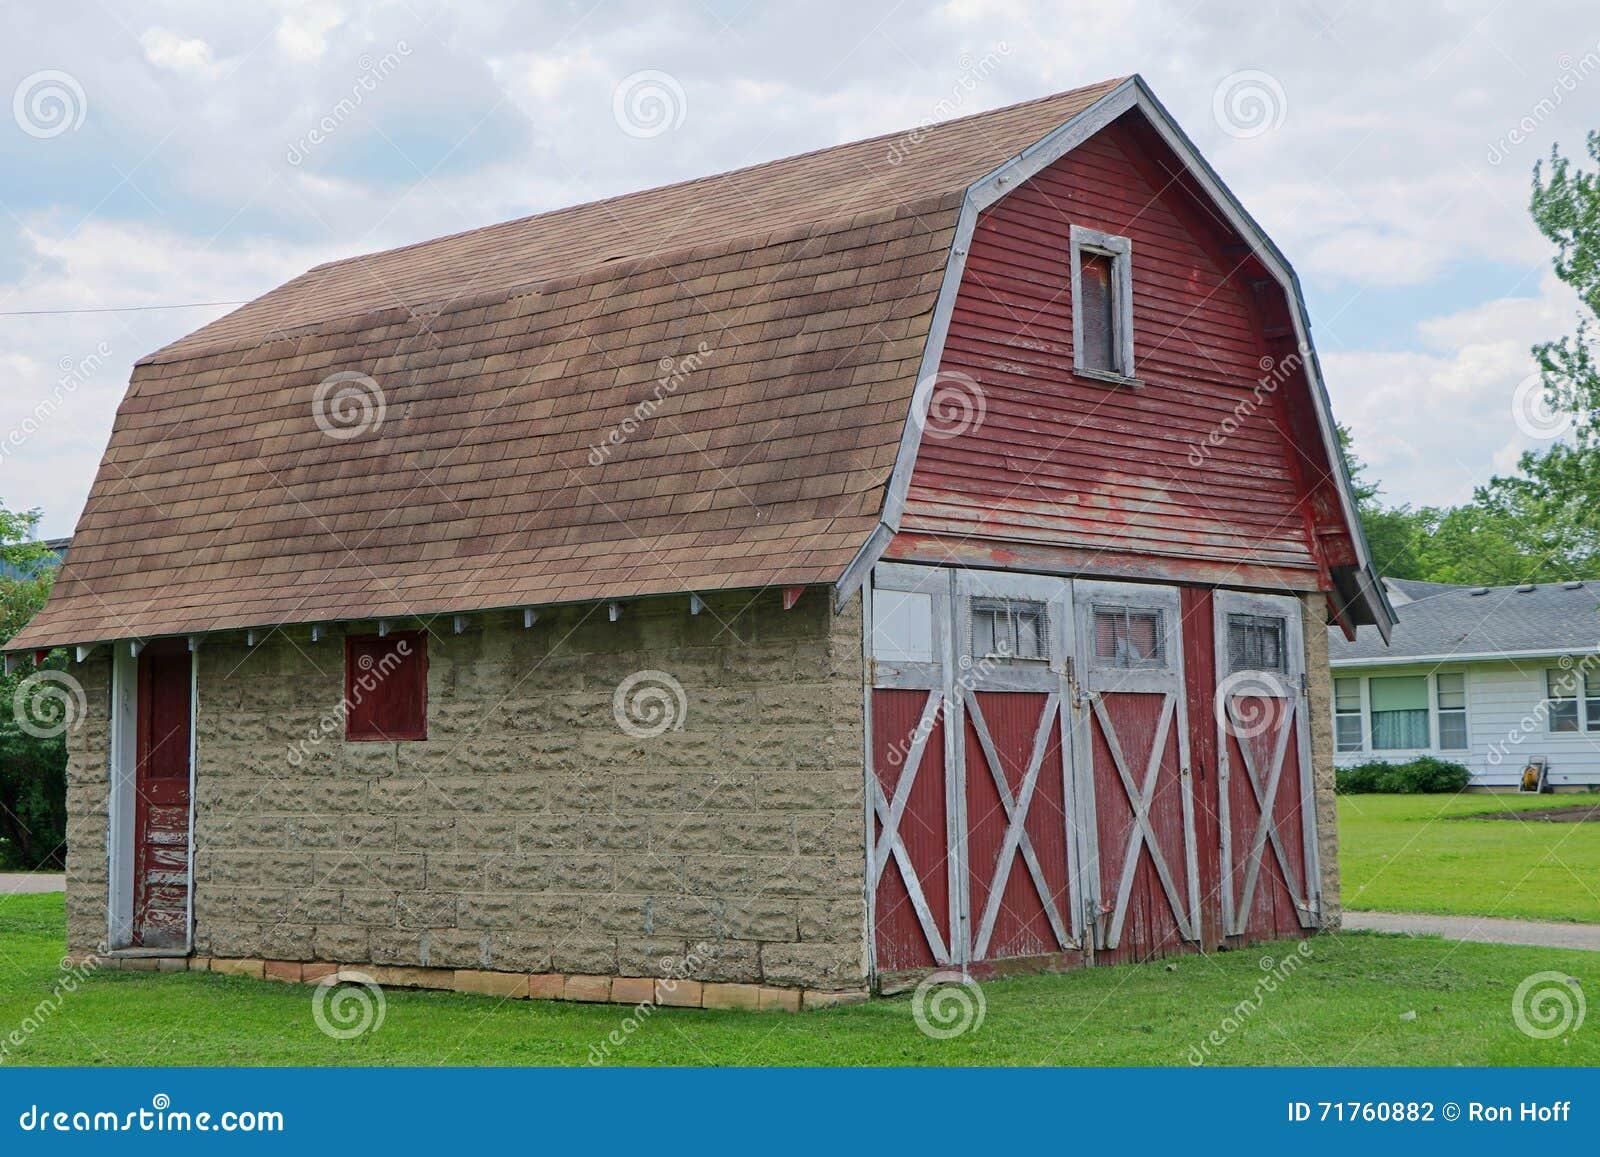 Red Weathered Barn Garage Stock Photo Image 71760882